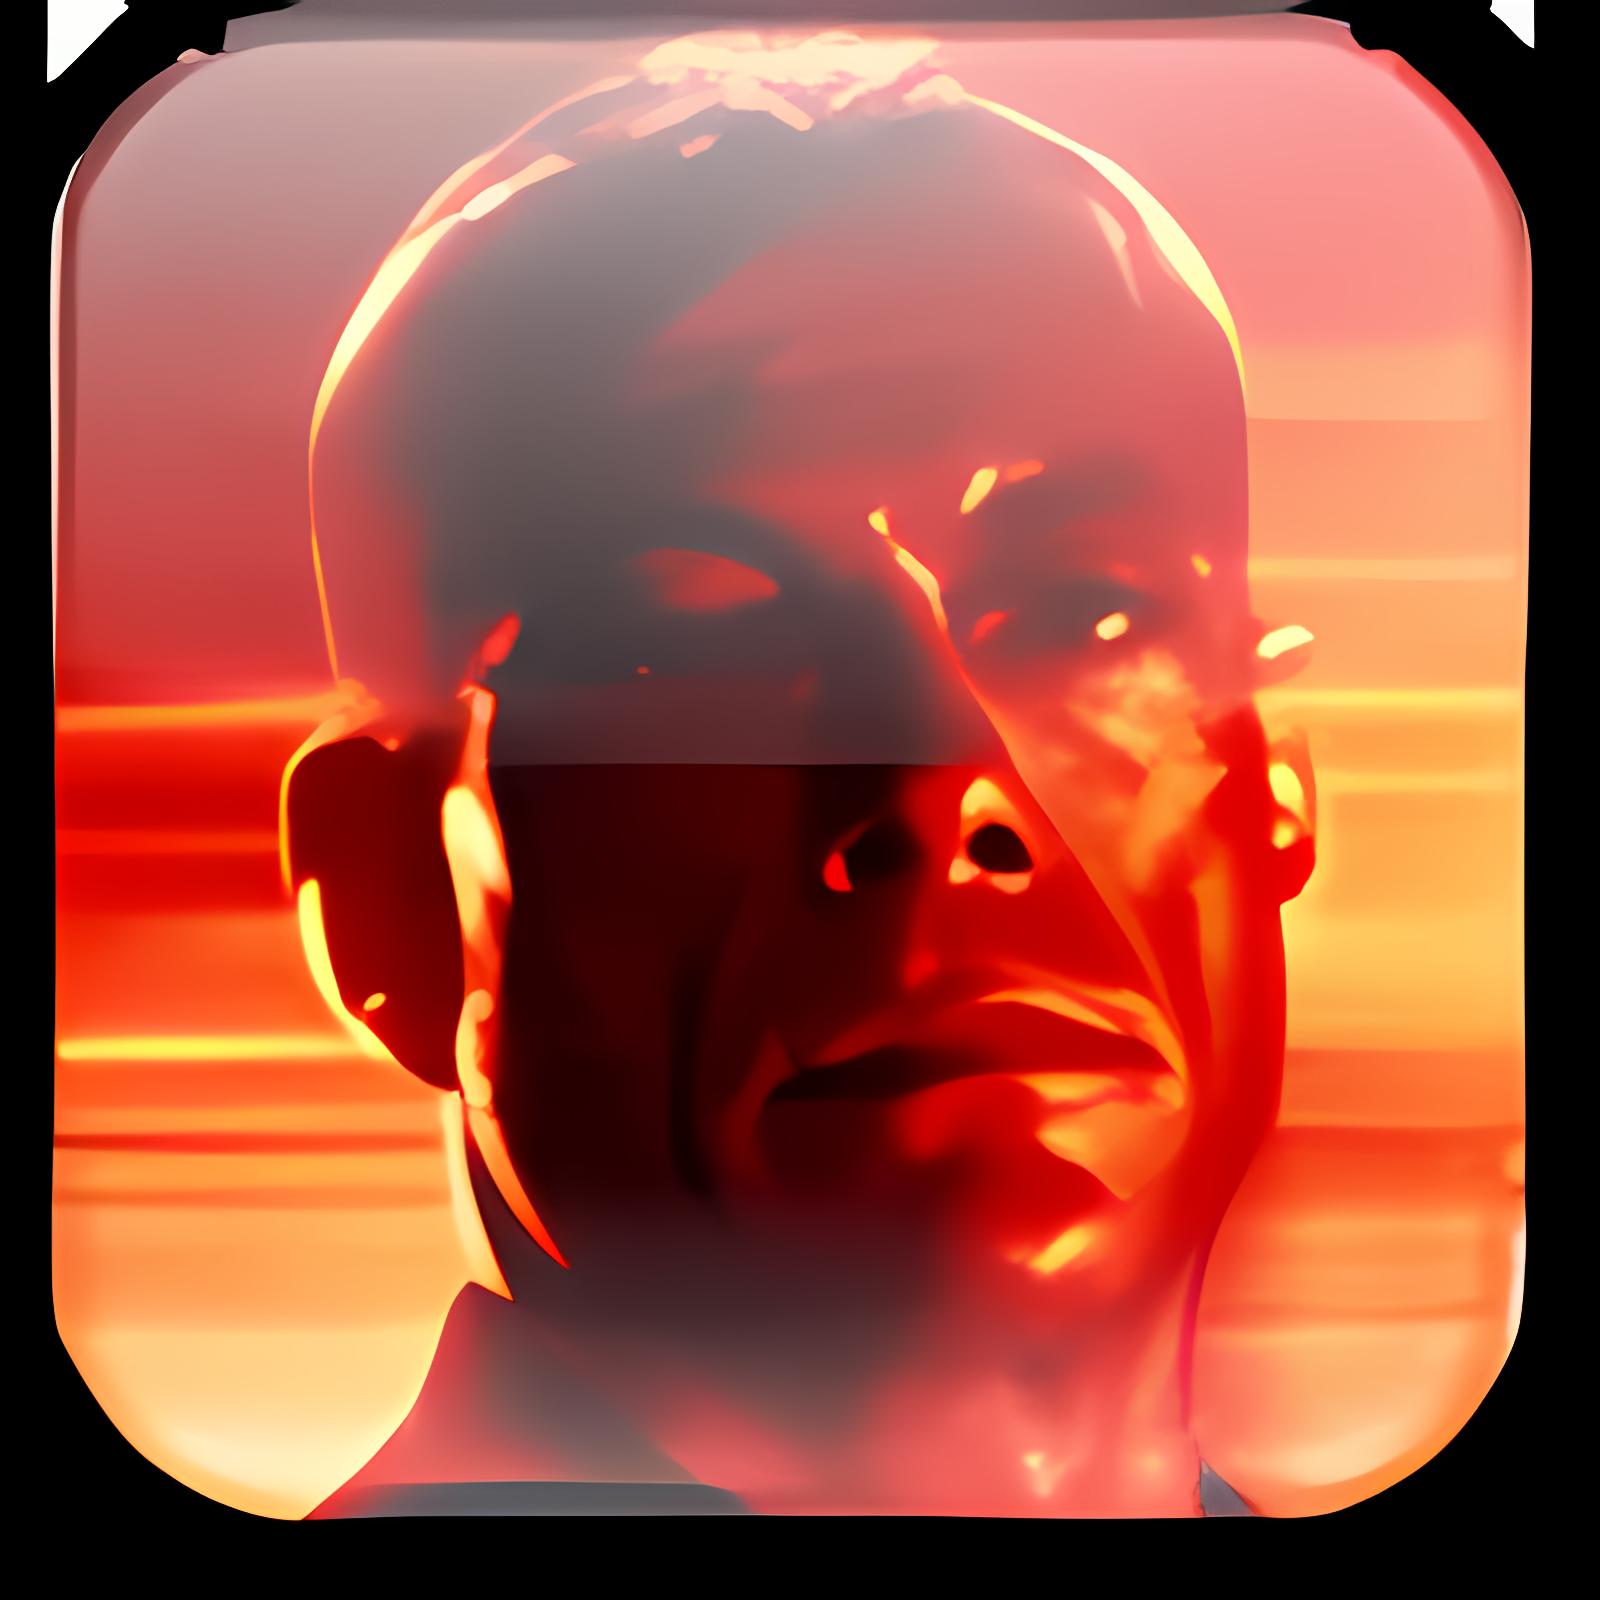 Fond d'écran Jean-Claude Van Damme (2)